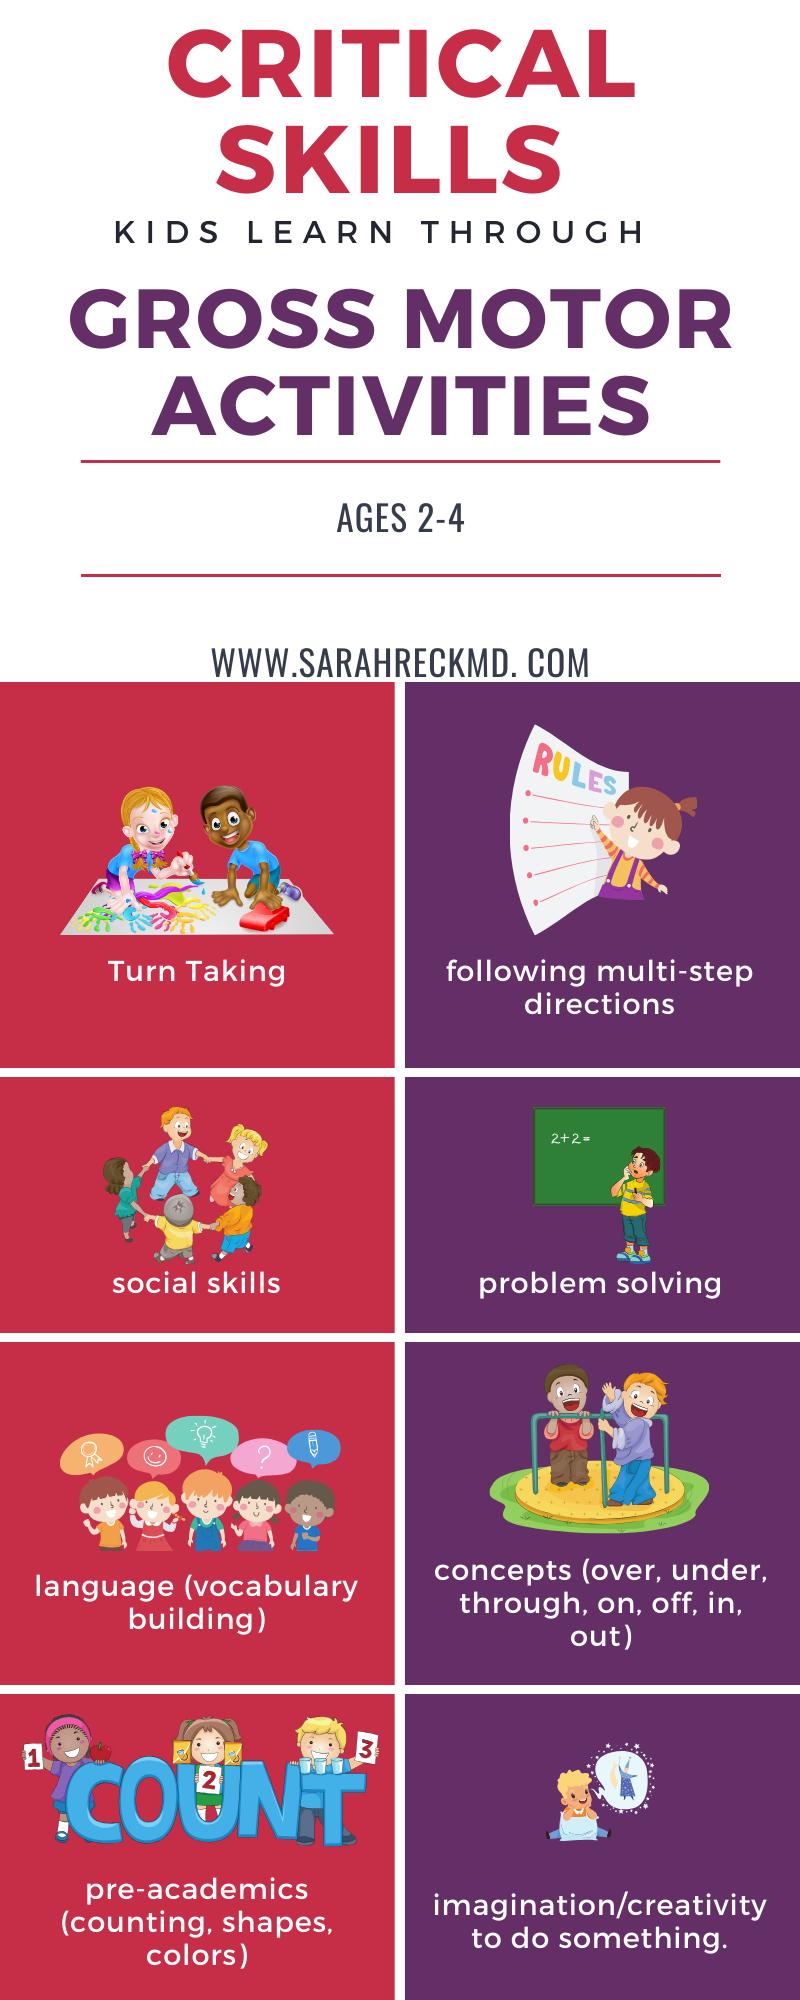 21 Developmental Activities To Reinforce Your Toddlers Motor Skills Sarah Reck Md Gross Motor Activities Physical Activities For Kids Kids Learning